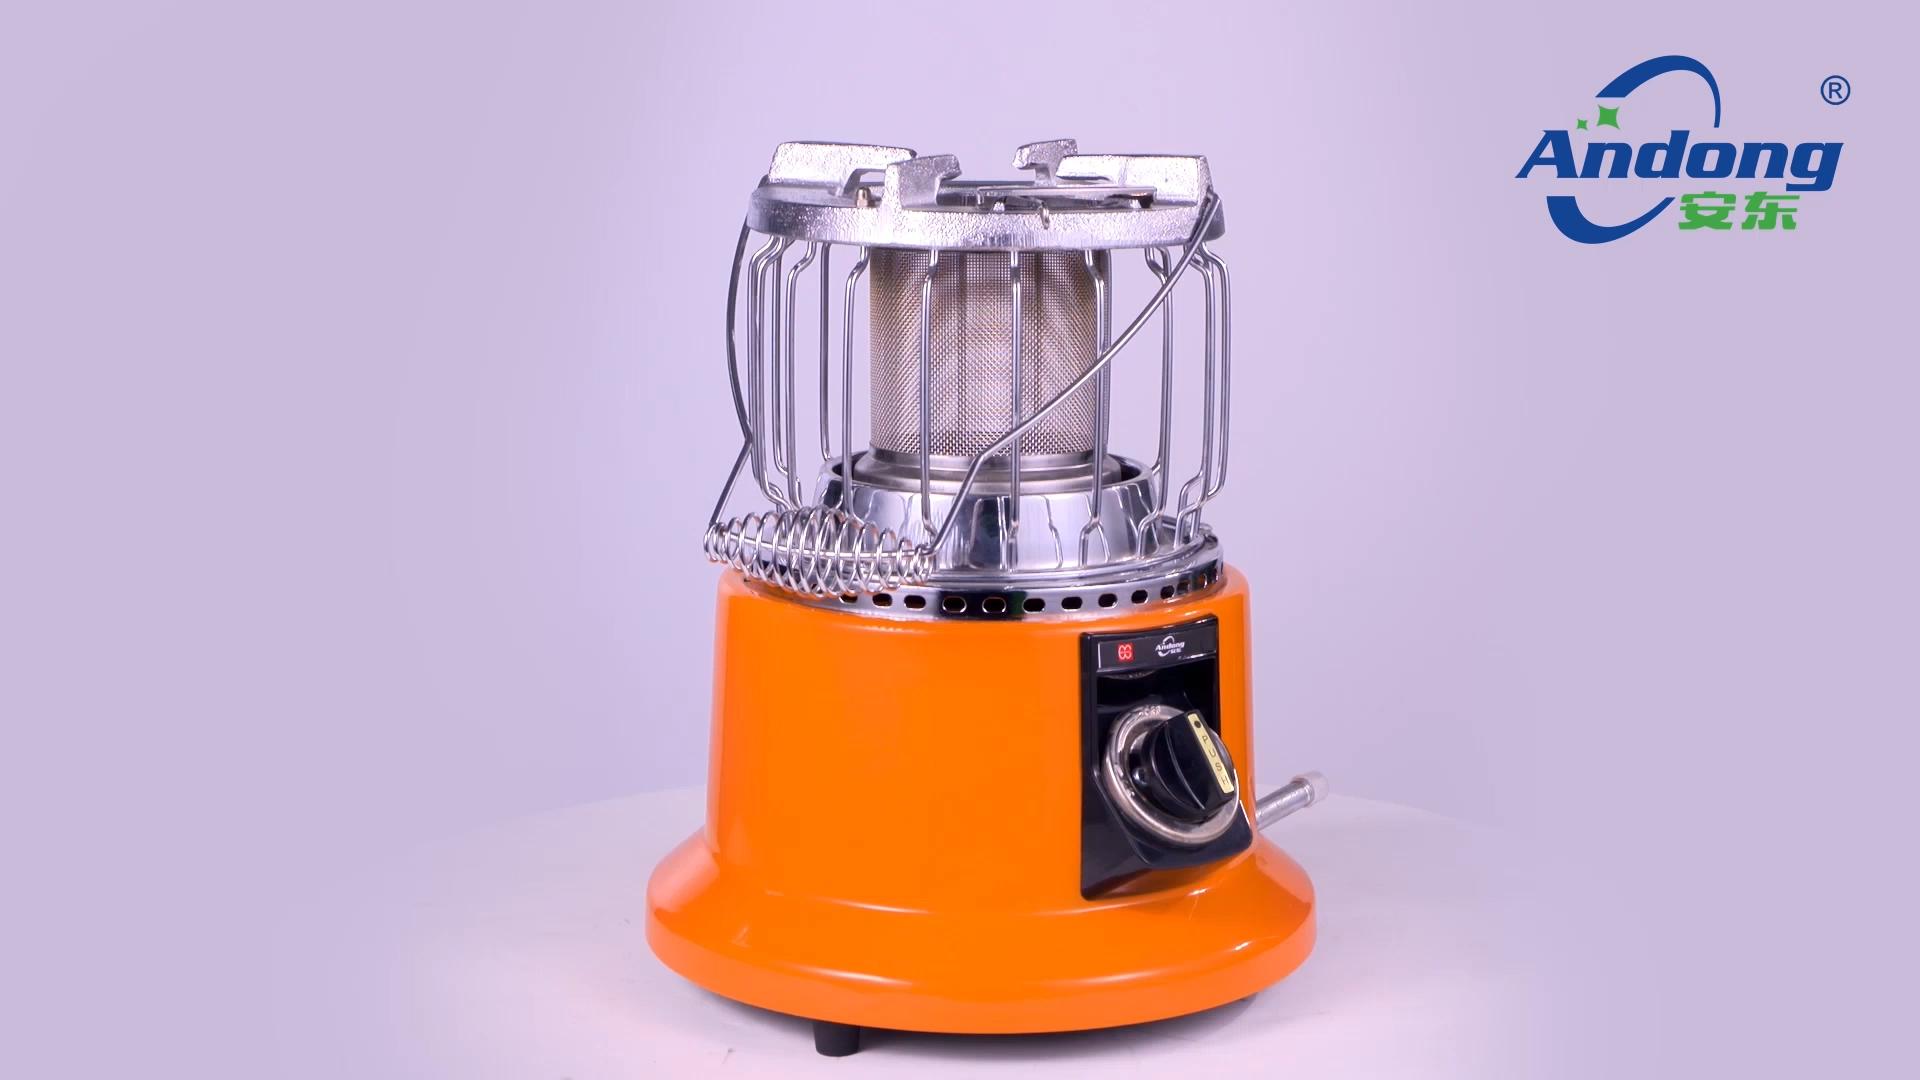 उच्च गुणवत्ता इनडोर पोर्टेबल गैस हीटर और कुकर पोर्टेबल एलपीजी प्राकृतिक गैस हीटर